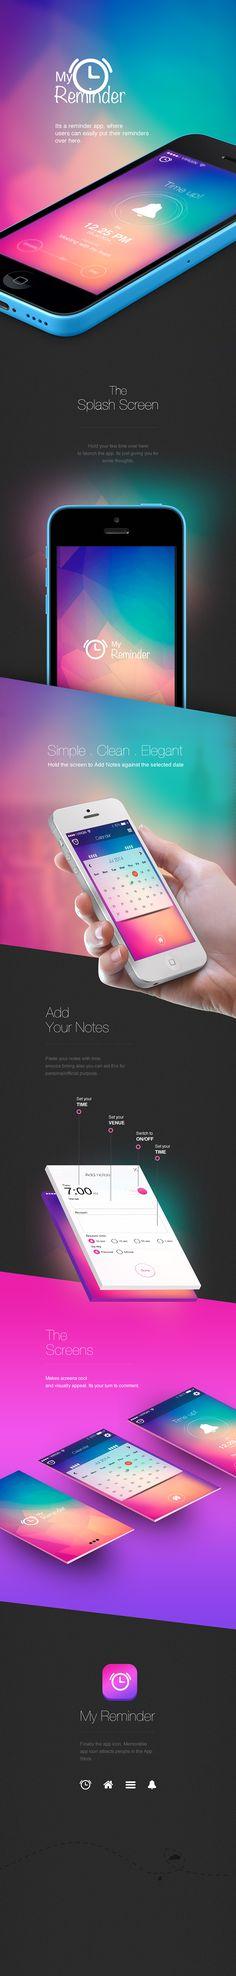 My Reminder iOS App Design on Behance